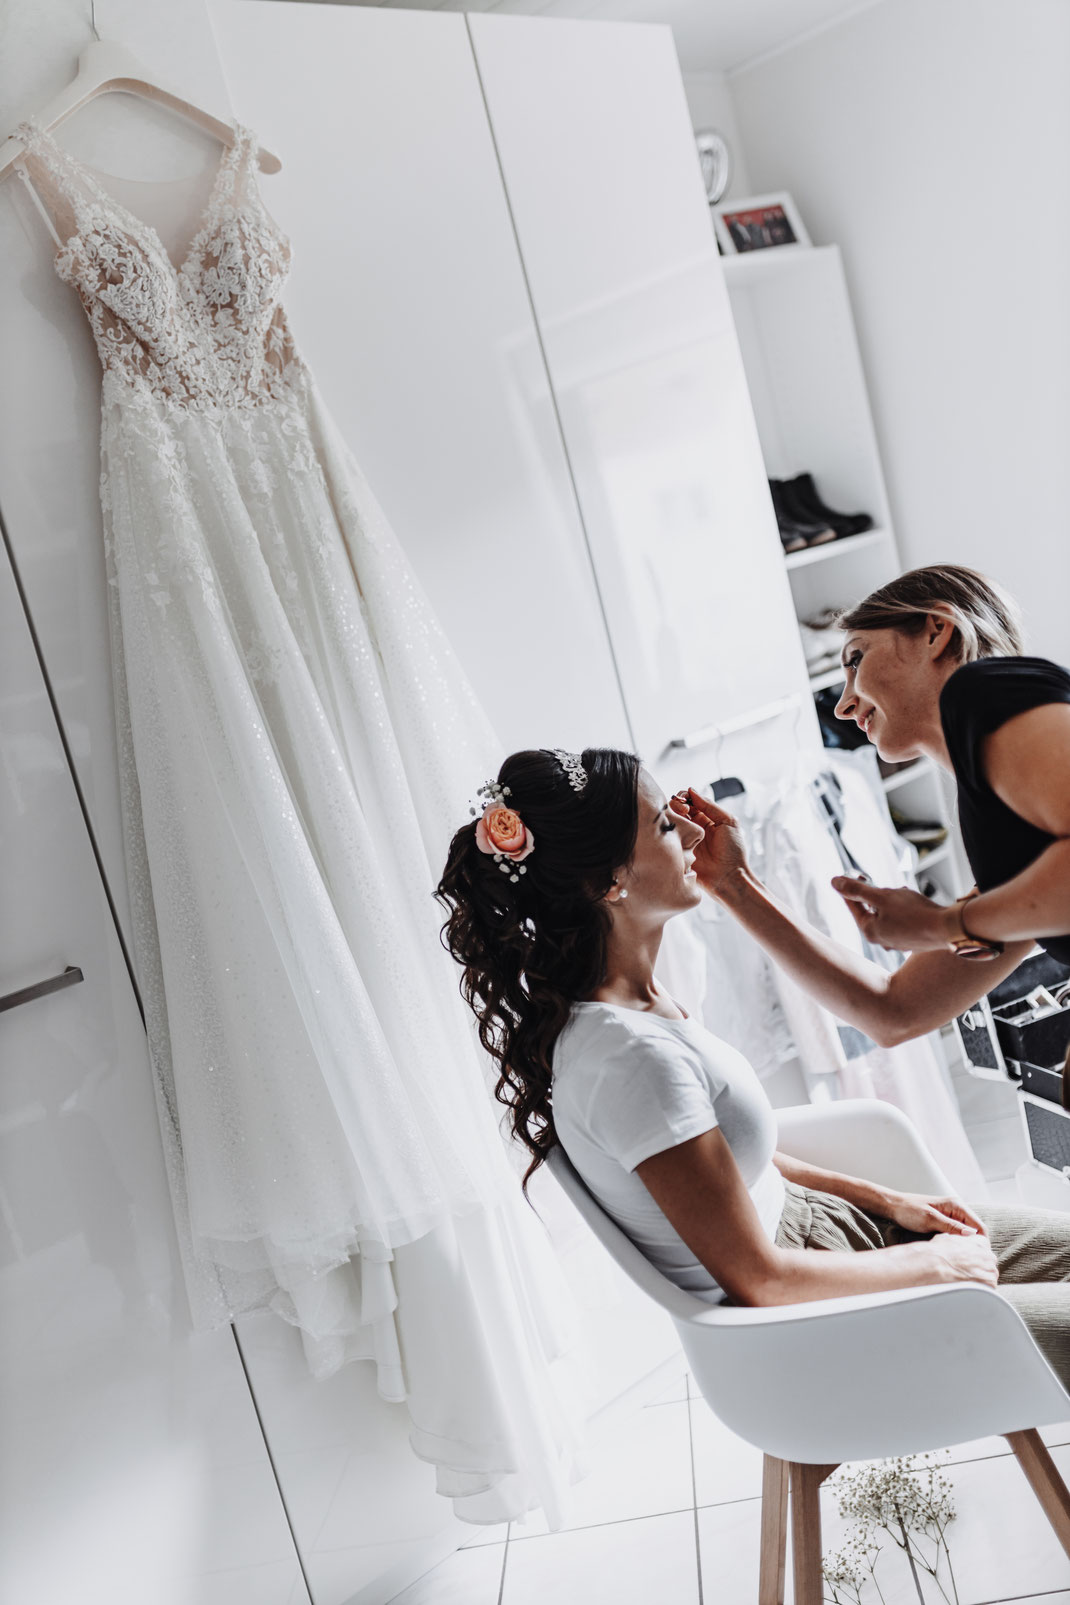 Hochzeitsfotograf Saarland - Fotograf Kai Kreutzer 131